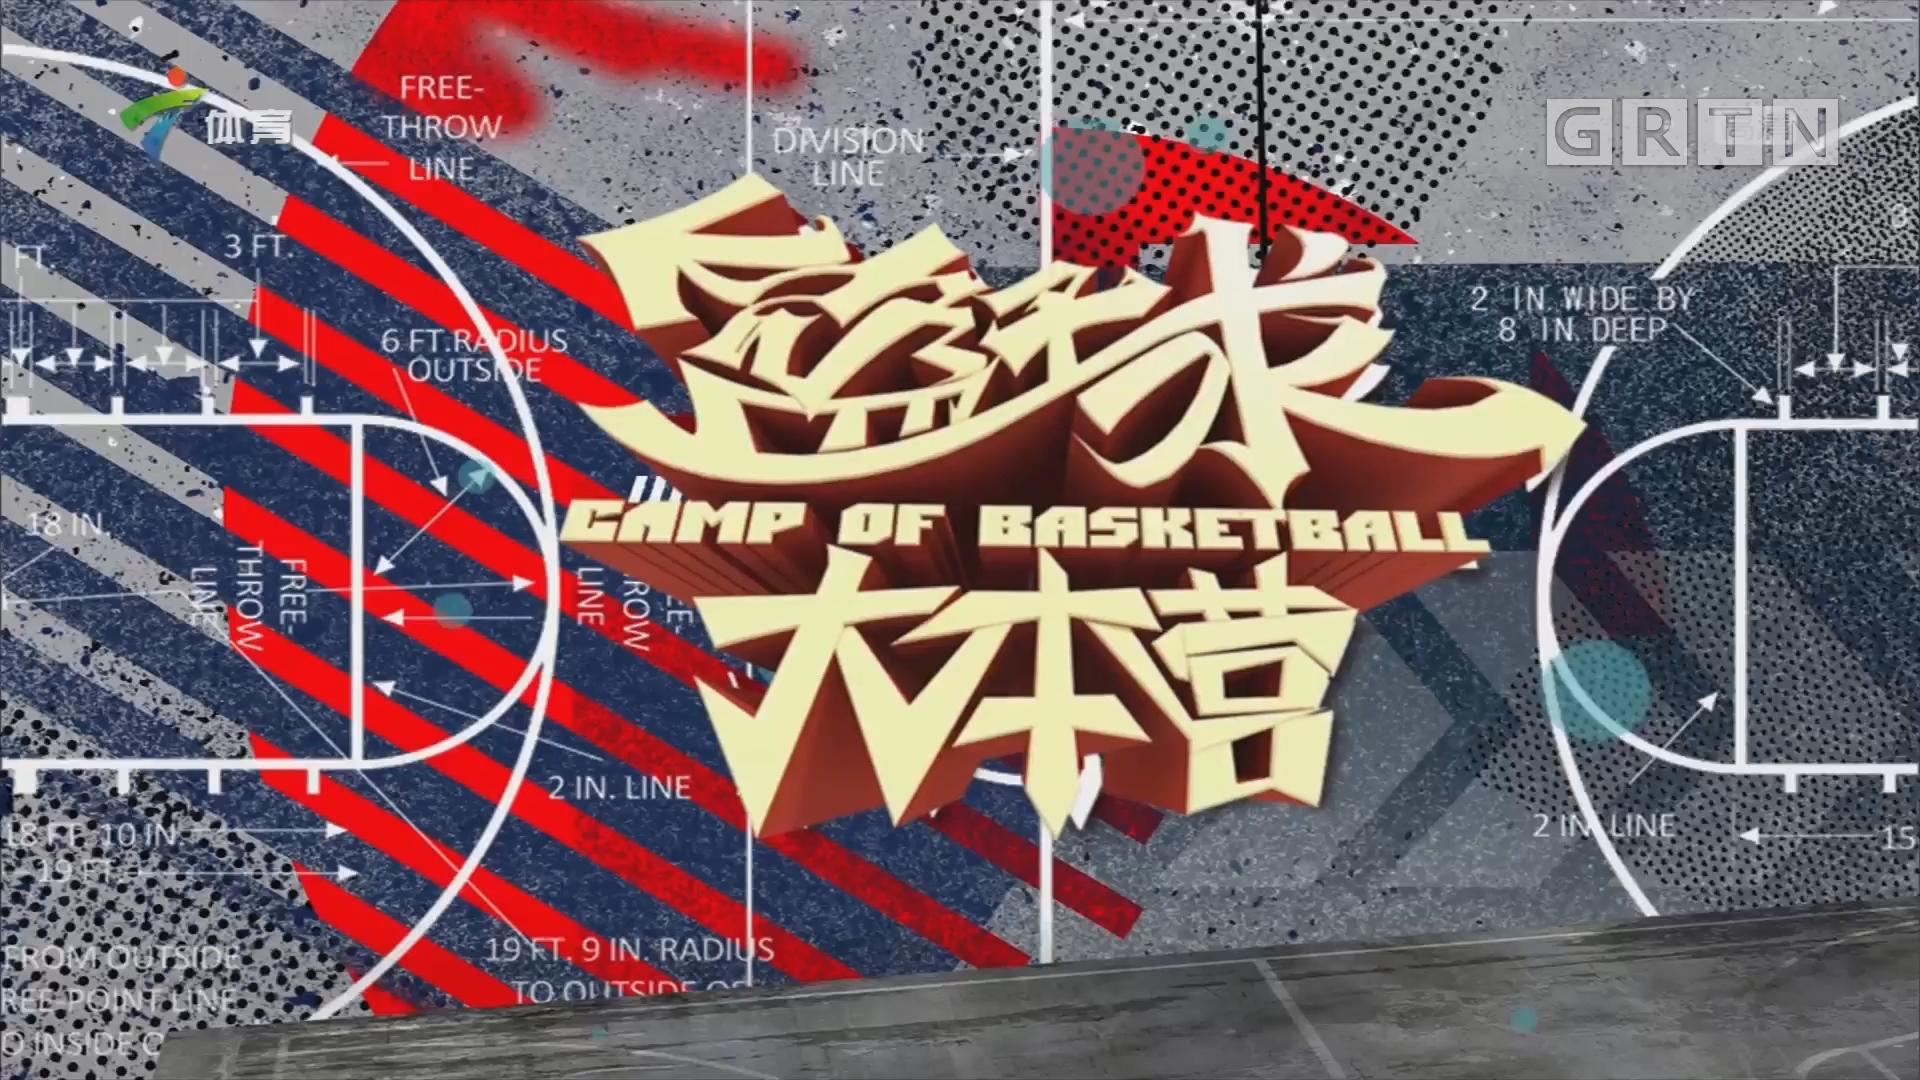 [HD][2018-03-28]篮球大本营:CBA半决赛 辽粤大战一触即发